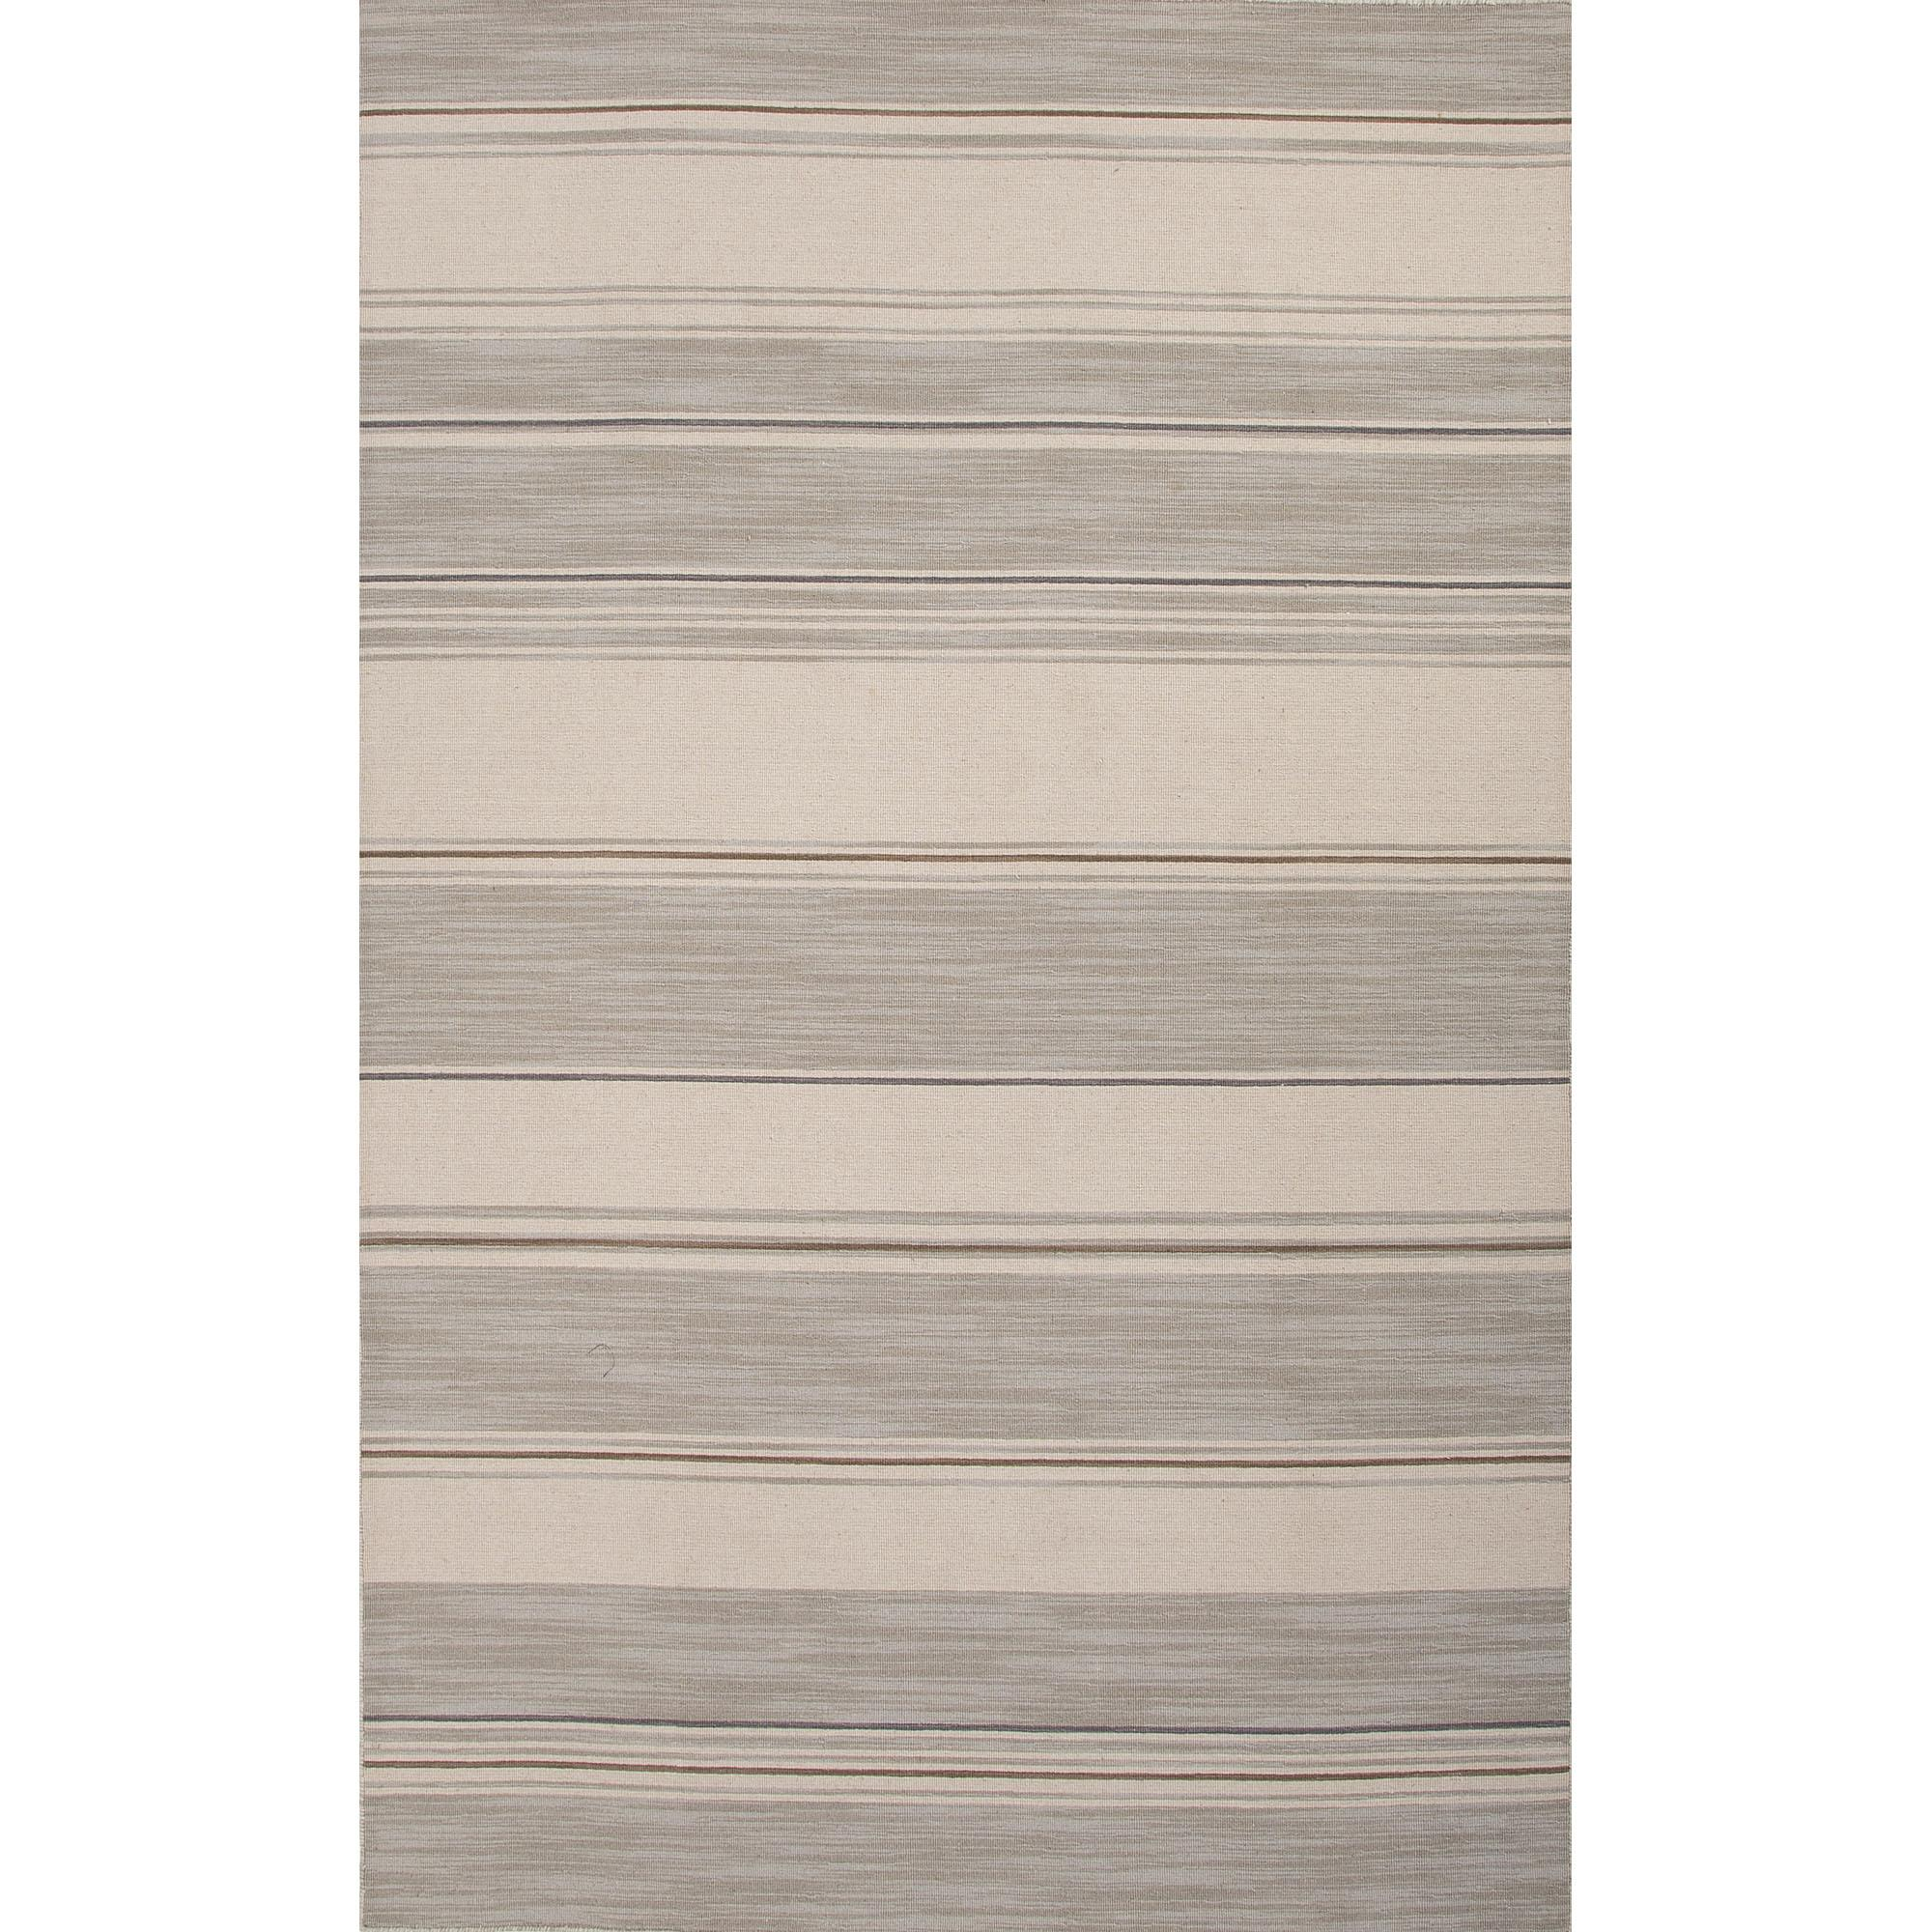 Coastal Shores 5 x 8 Rug by JAIPUR Living at Malouf Furniture Co.